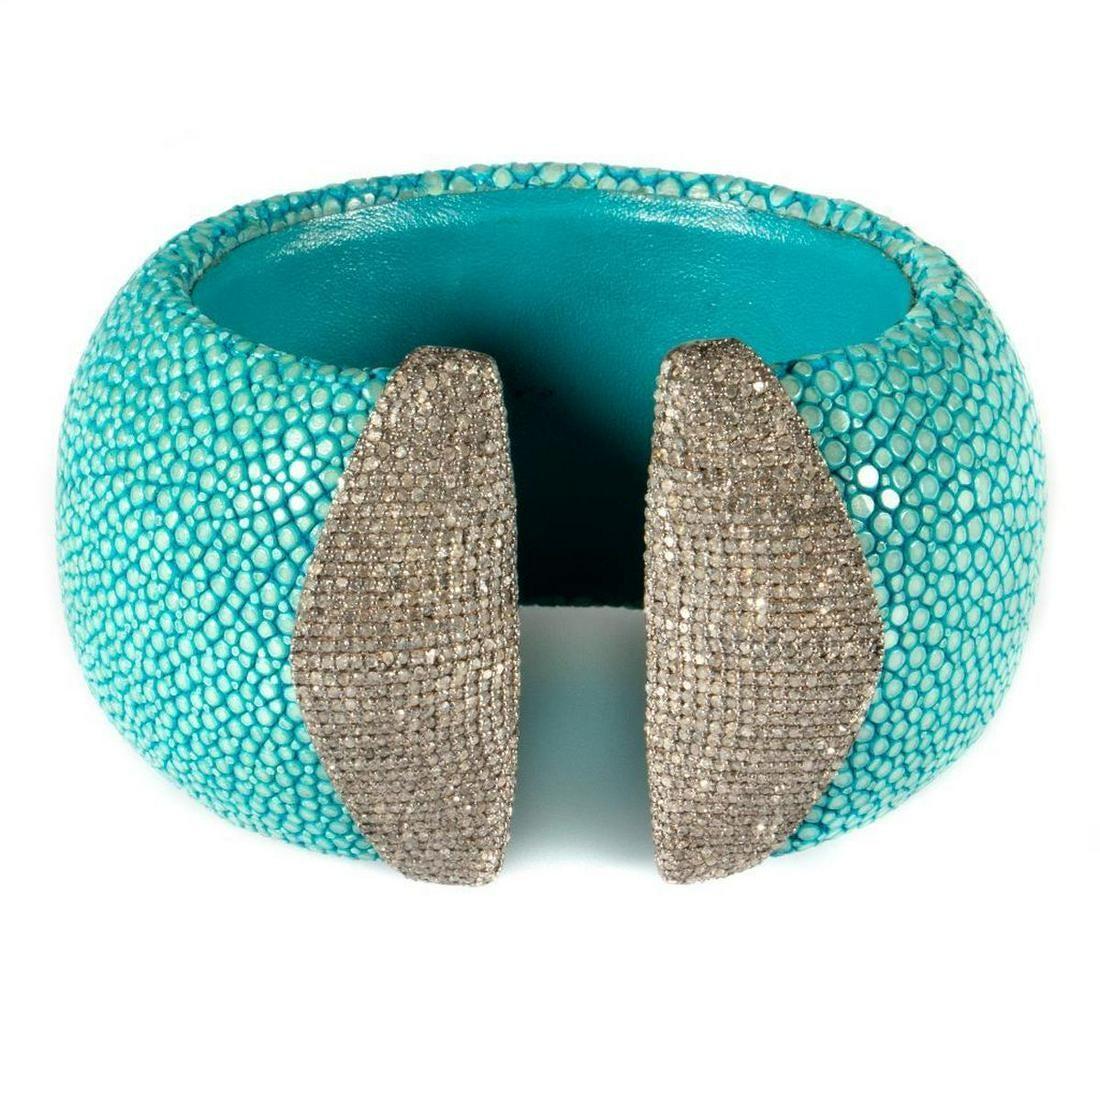 Diamond, stingray and blackened silver cuff bracelet